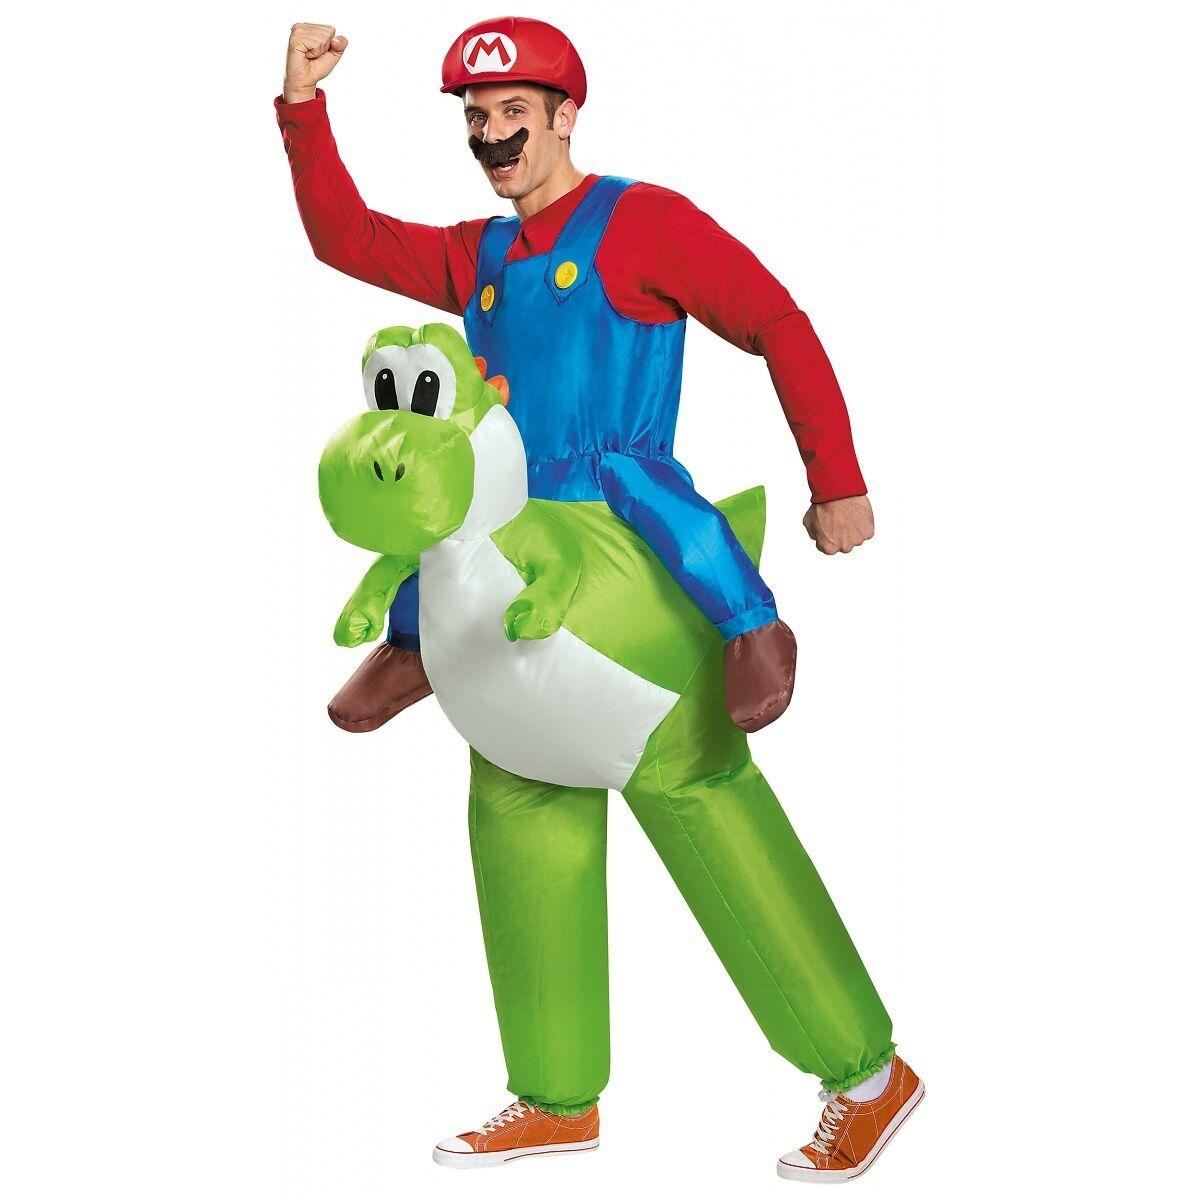 adult super mario riding yoshi inflatable costume dg85150ad | ebay